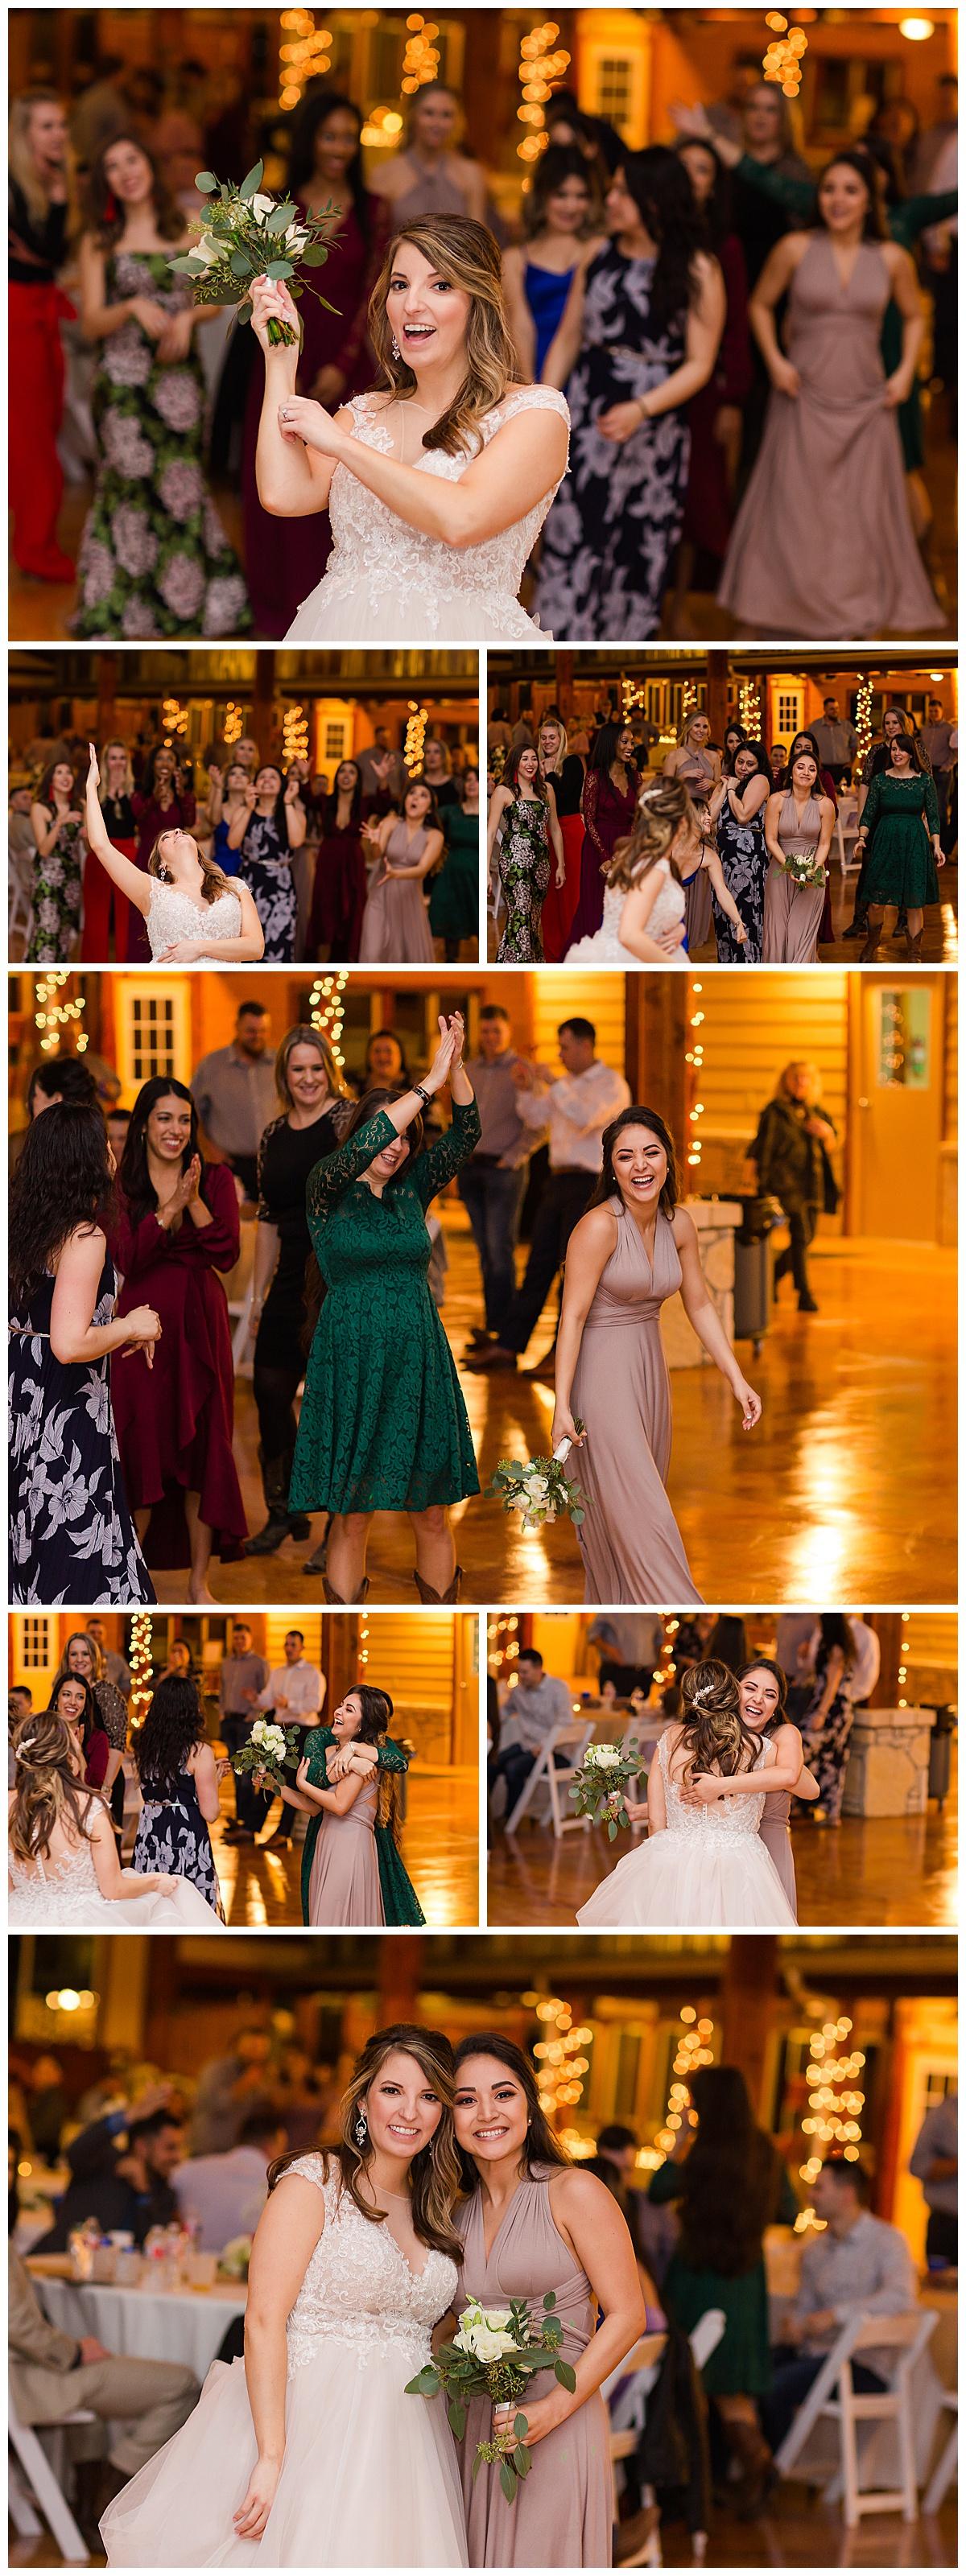 Wedding-Photographer-Texas-Hill-Country-Happy-H-Ranch-Comfor-Texas-Carly-Barton-Photography_0086.jpg